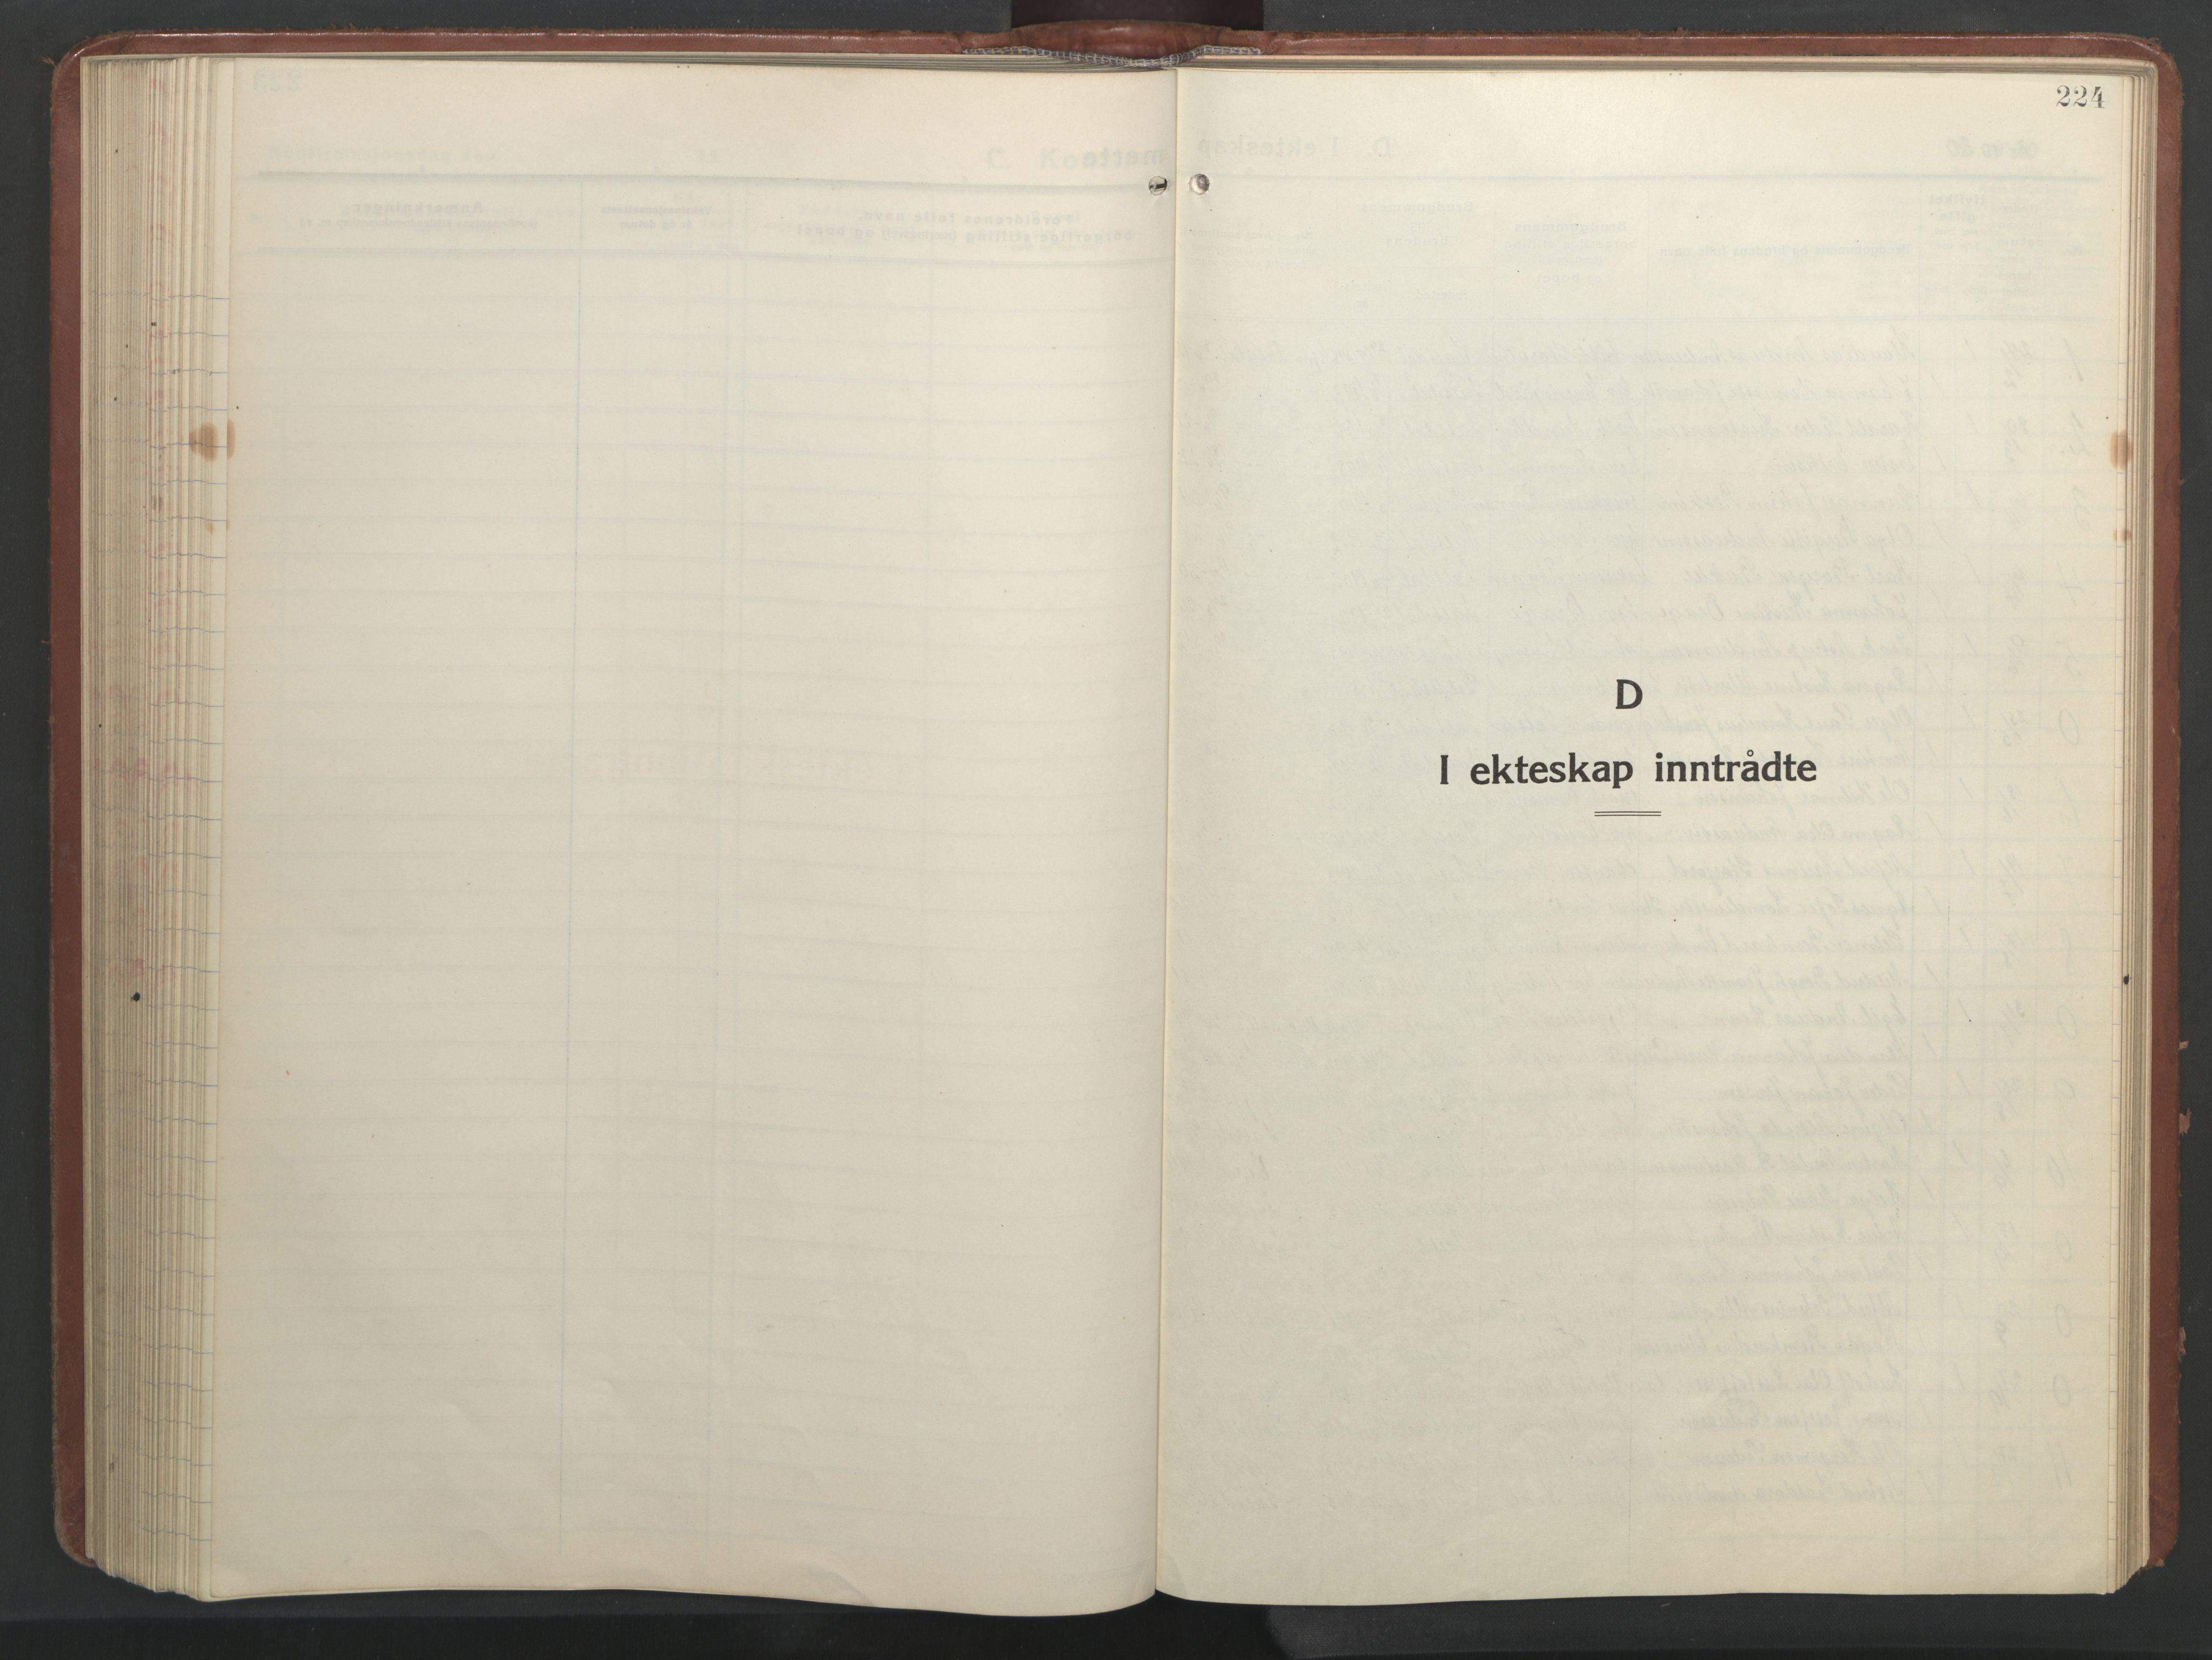 SAT, Ministerialprotokoller, klokkerbøker og fødselsregistre - Nordland, 847/L0680: Klokkerbok nr. 847C08, 1930-1947, s. 224